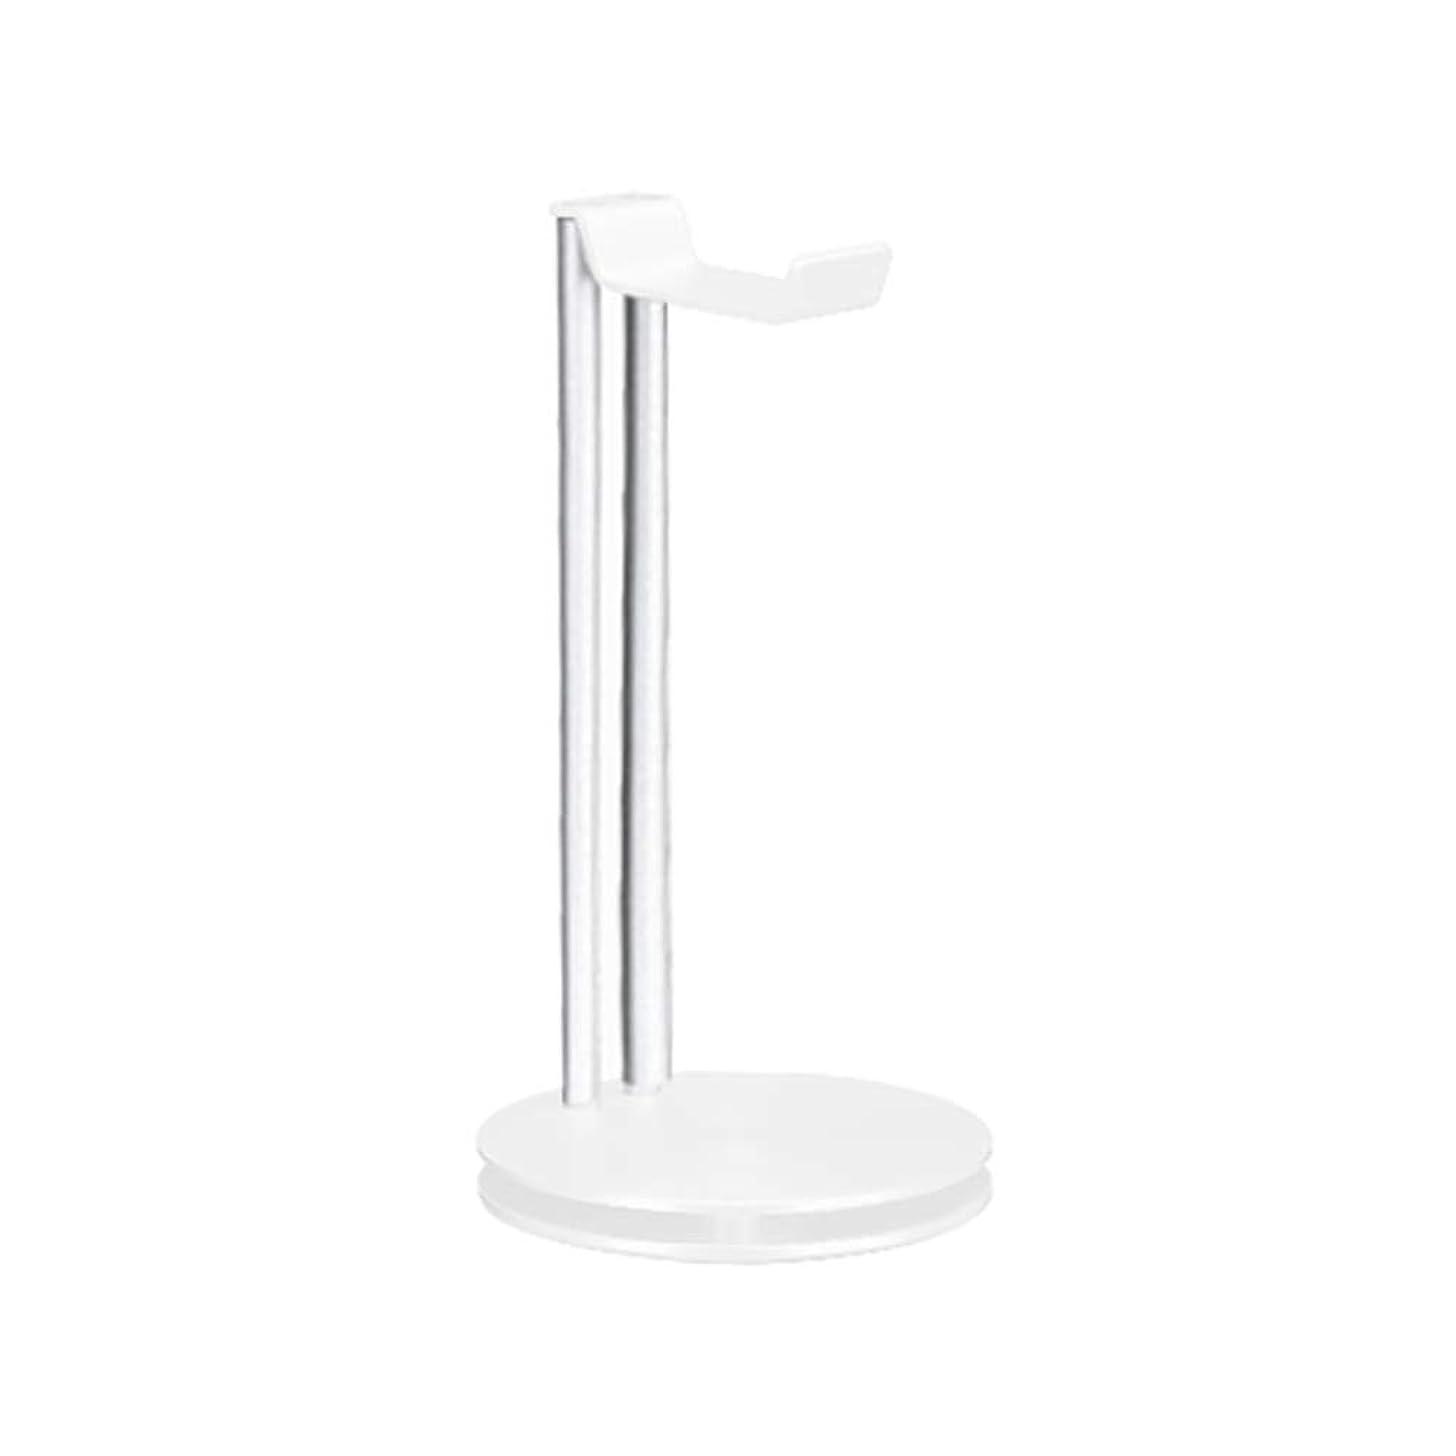 SuBoZhuLiuJ Headset Holder Rack,Universal Aluminium Alloy Headset Stand Holder Bracket Display Rack Organizer - White